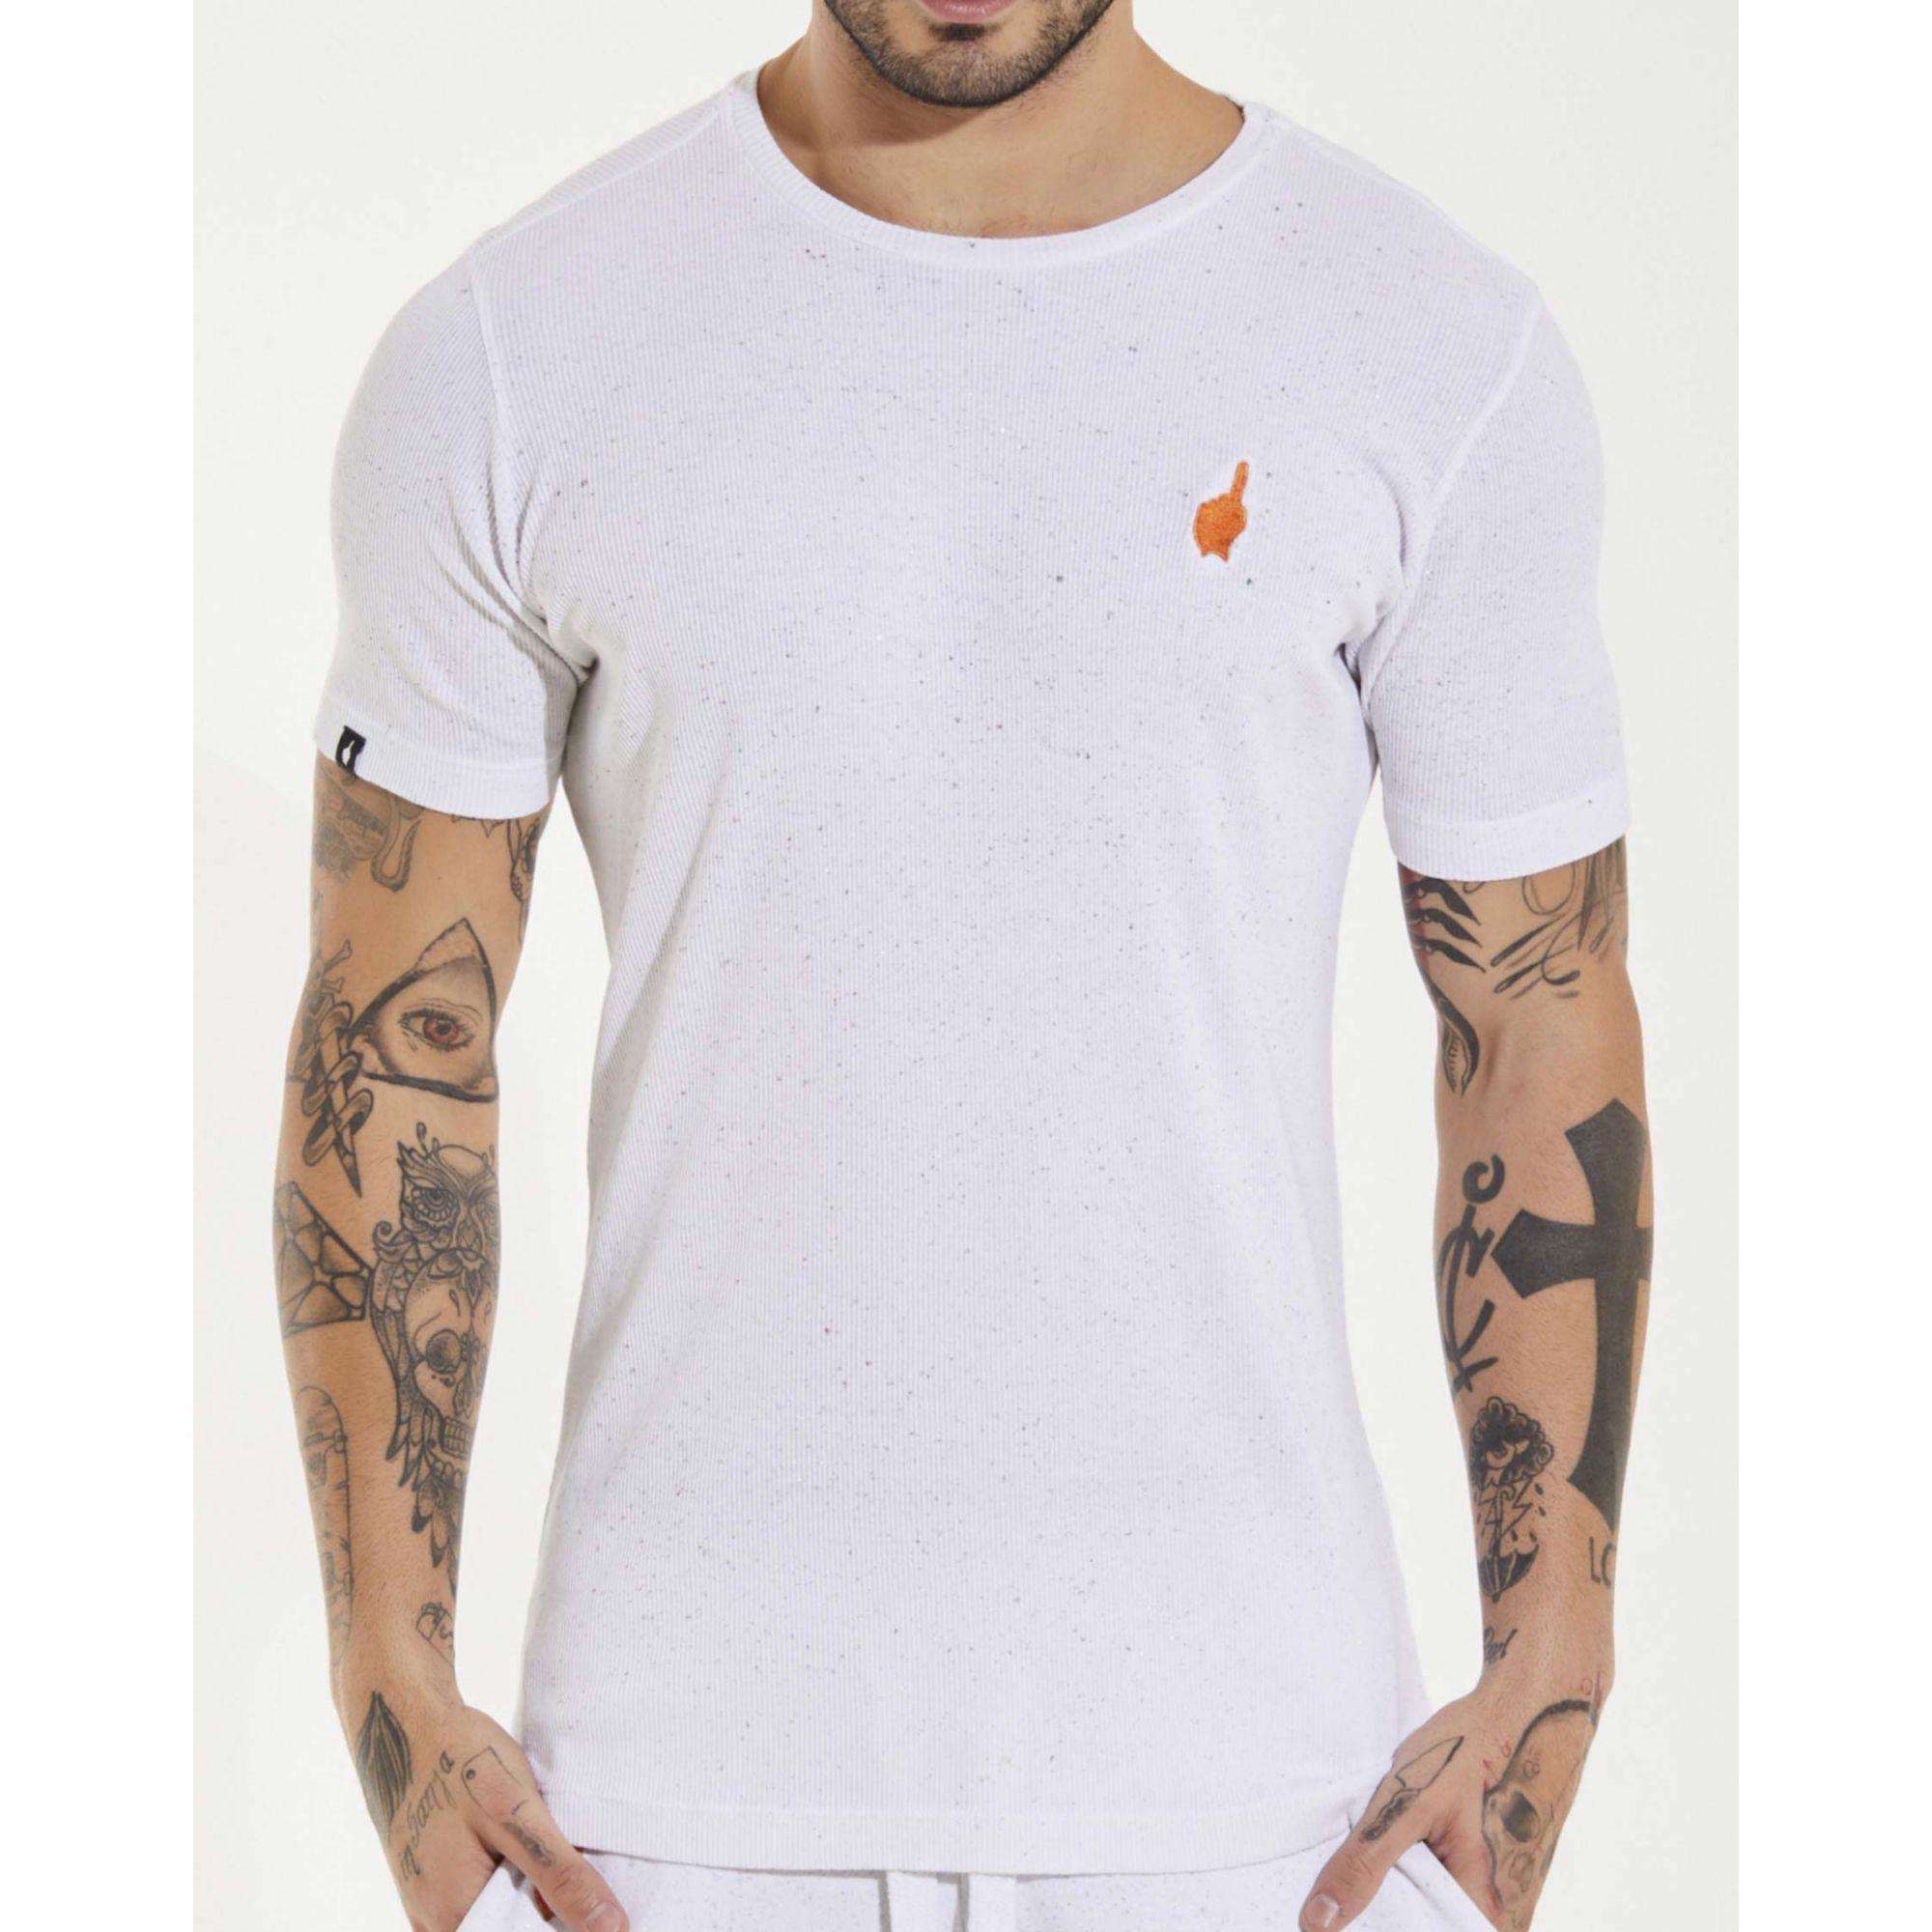 Camiseta Buh Explosão White